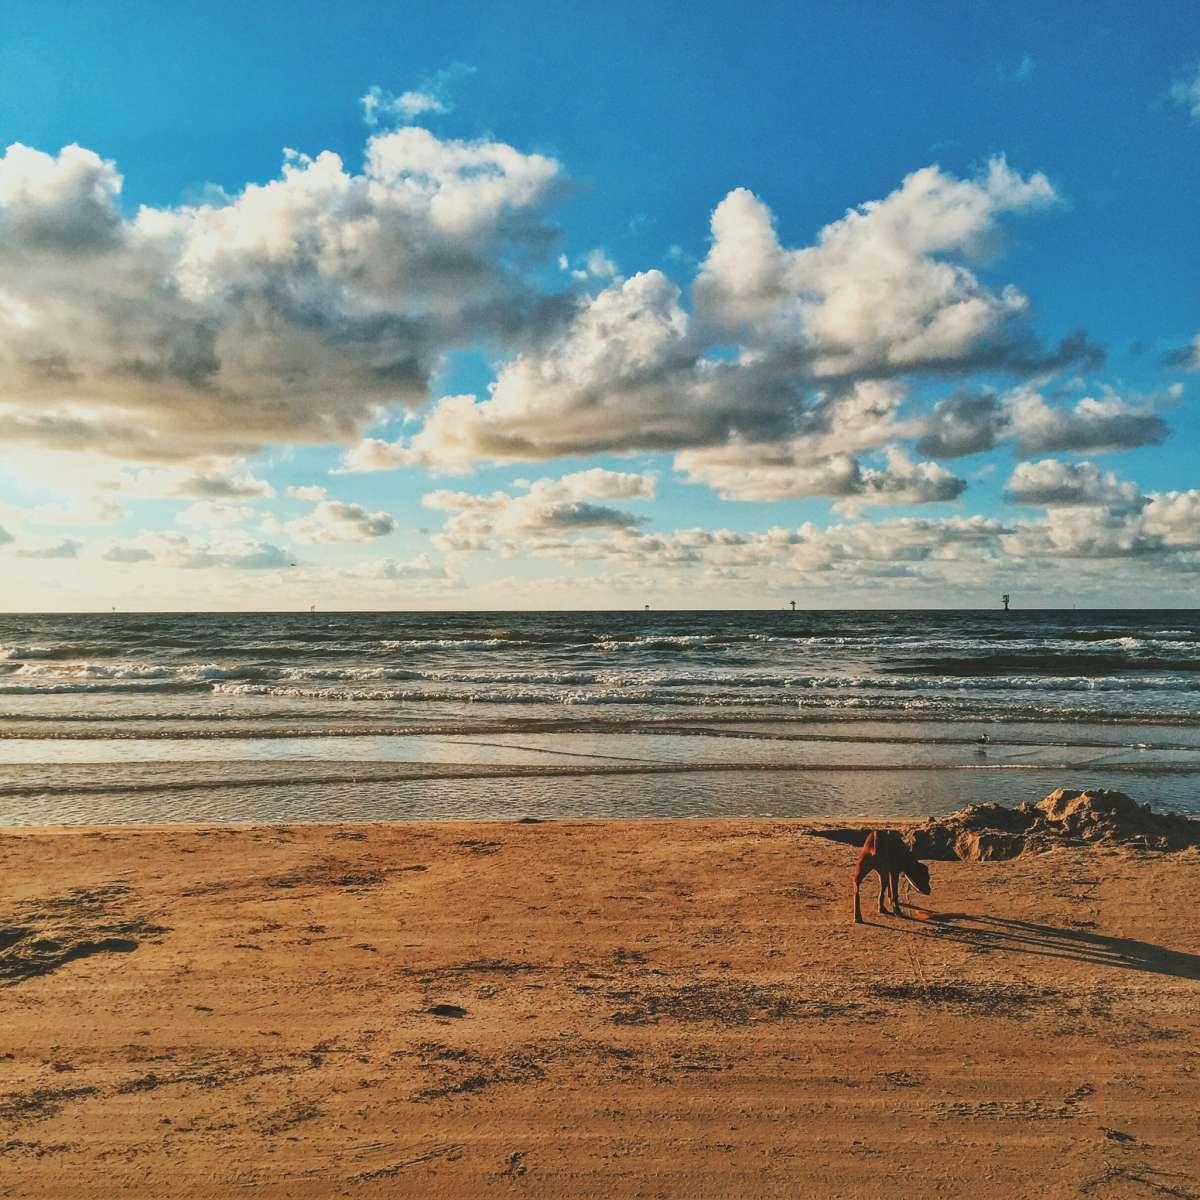 Mustang Island Beach: Mustang Island Campground, Mustang Island, TX: 8 Hipcamper